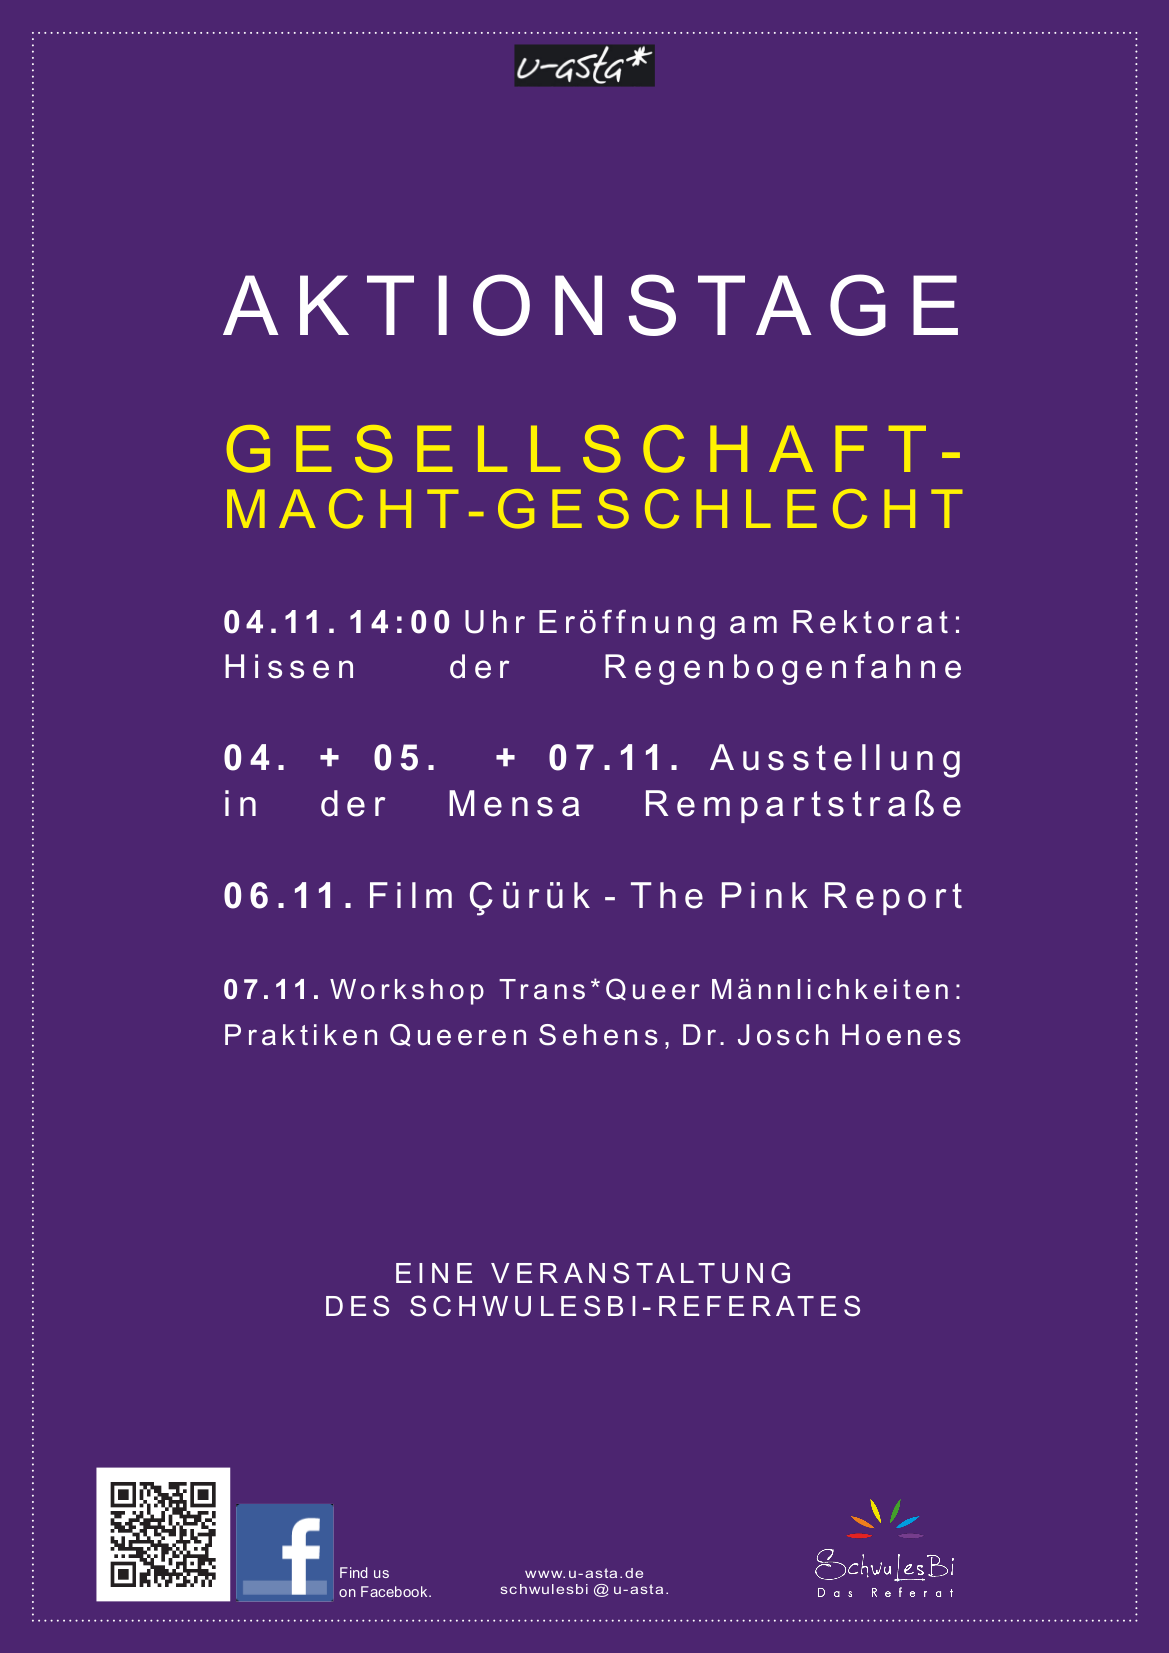 plakate der aktionstage im november 2013